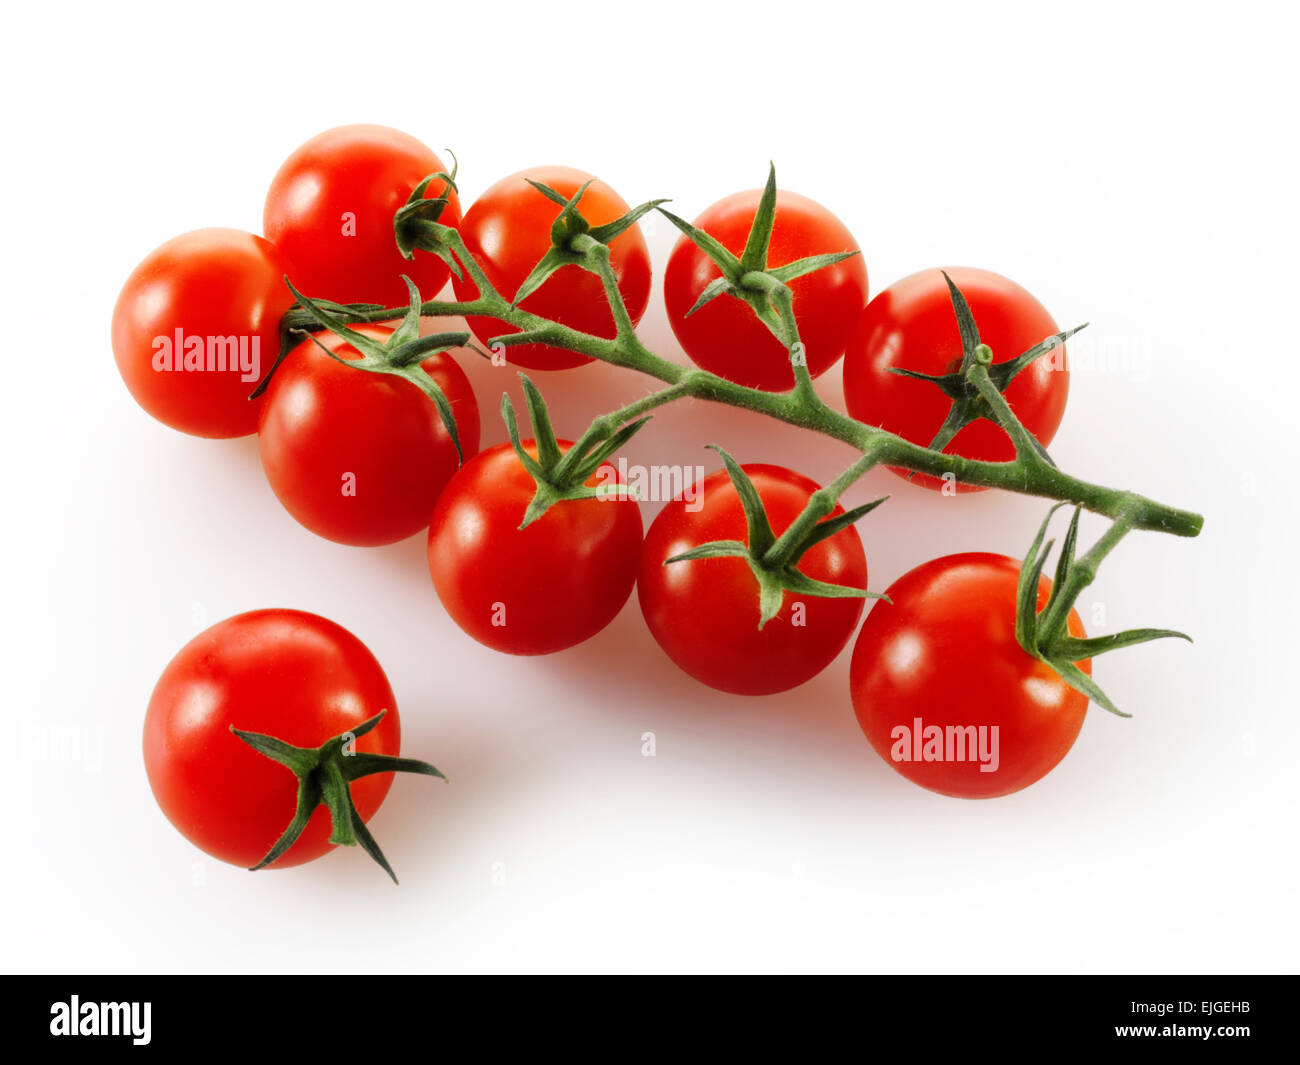 Vittoris vine tomatoes on white background - Stock Image